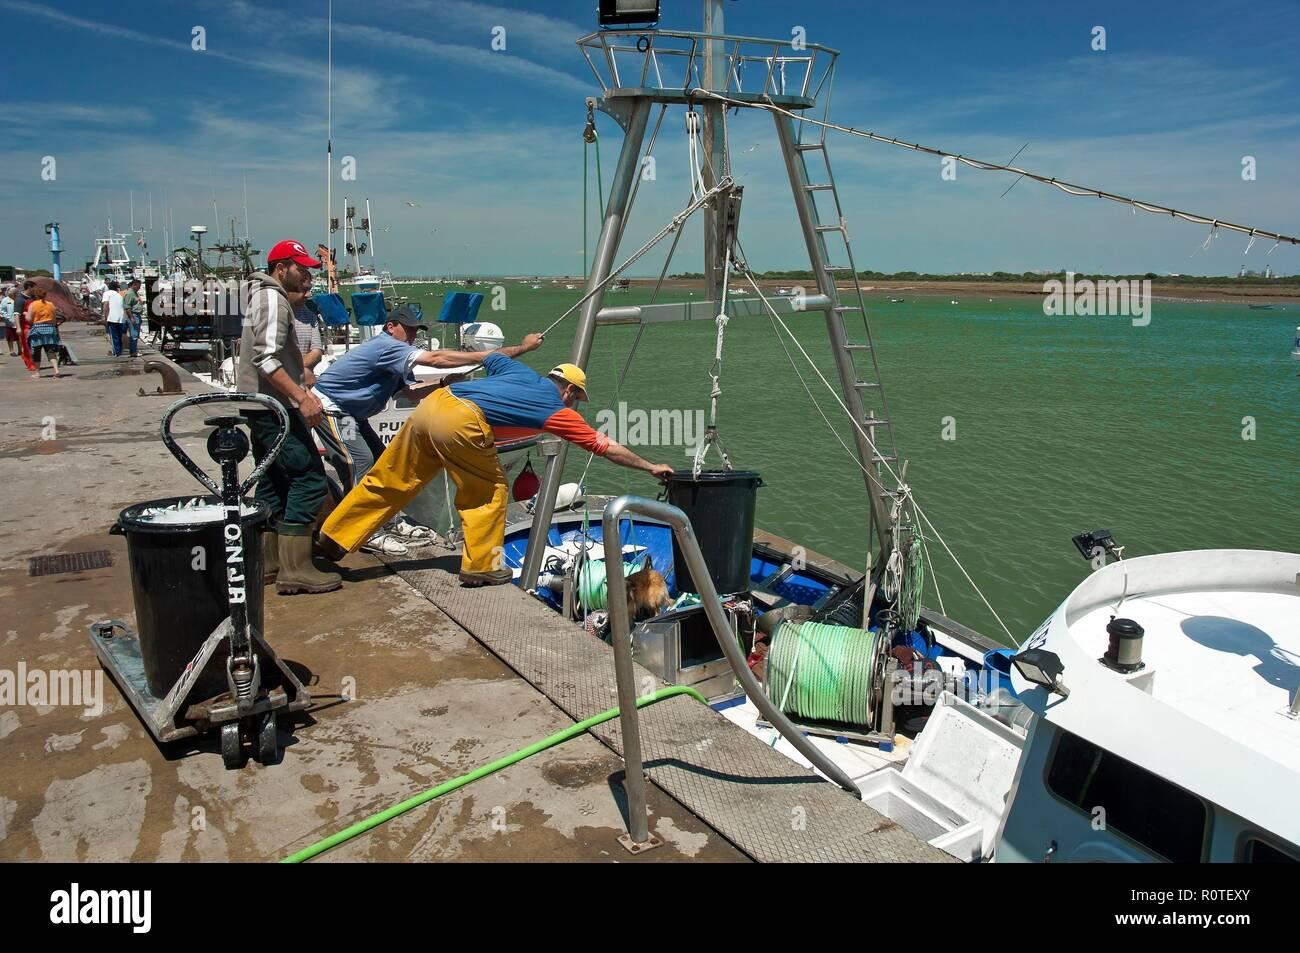 Puerto pesquero, Punta Umbría, Huelva, provincia, región de Andalucía, España, Europa. Foto de stock